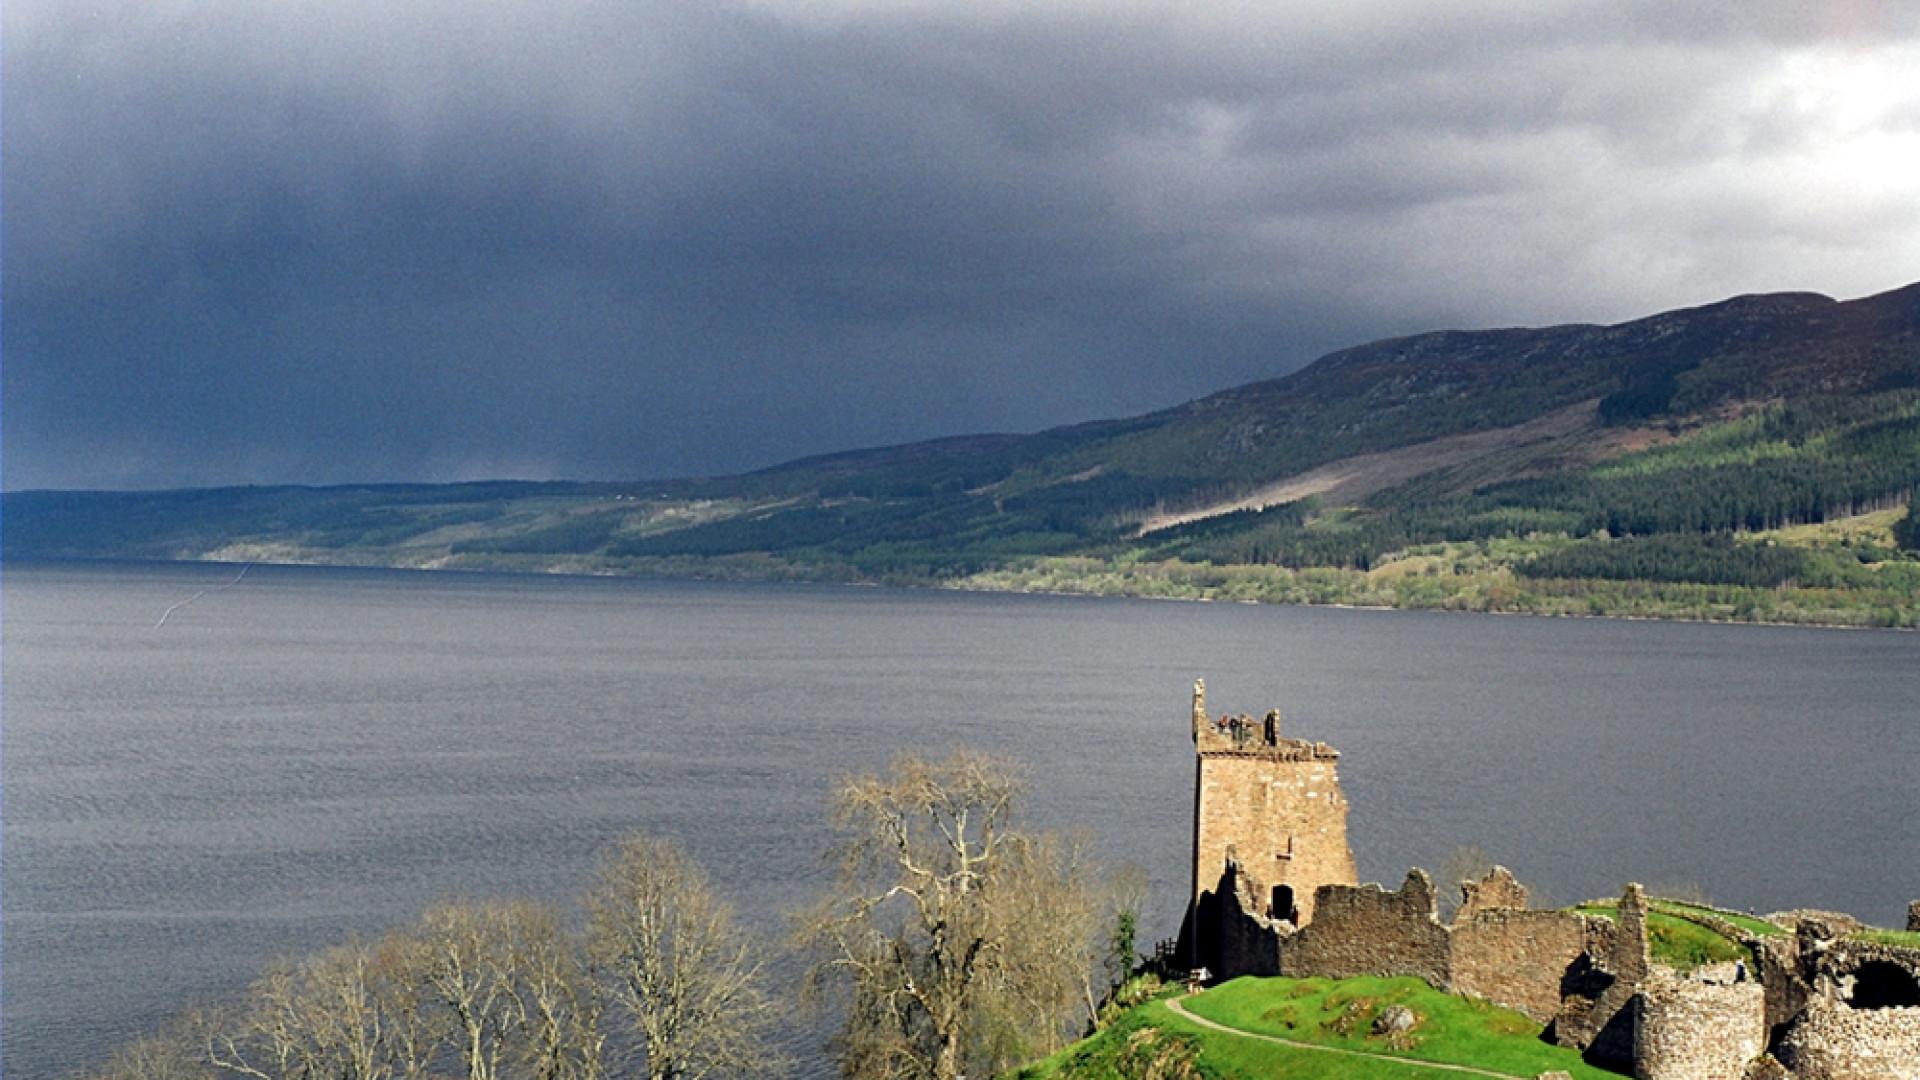 A lenda do monstro de Loch Ness pode ter os dias contados